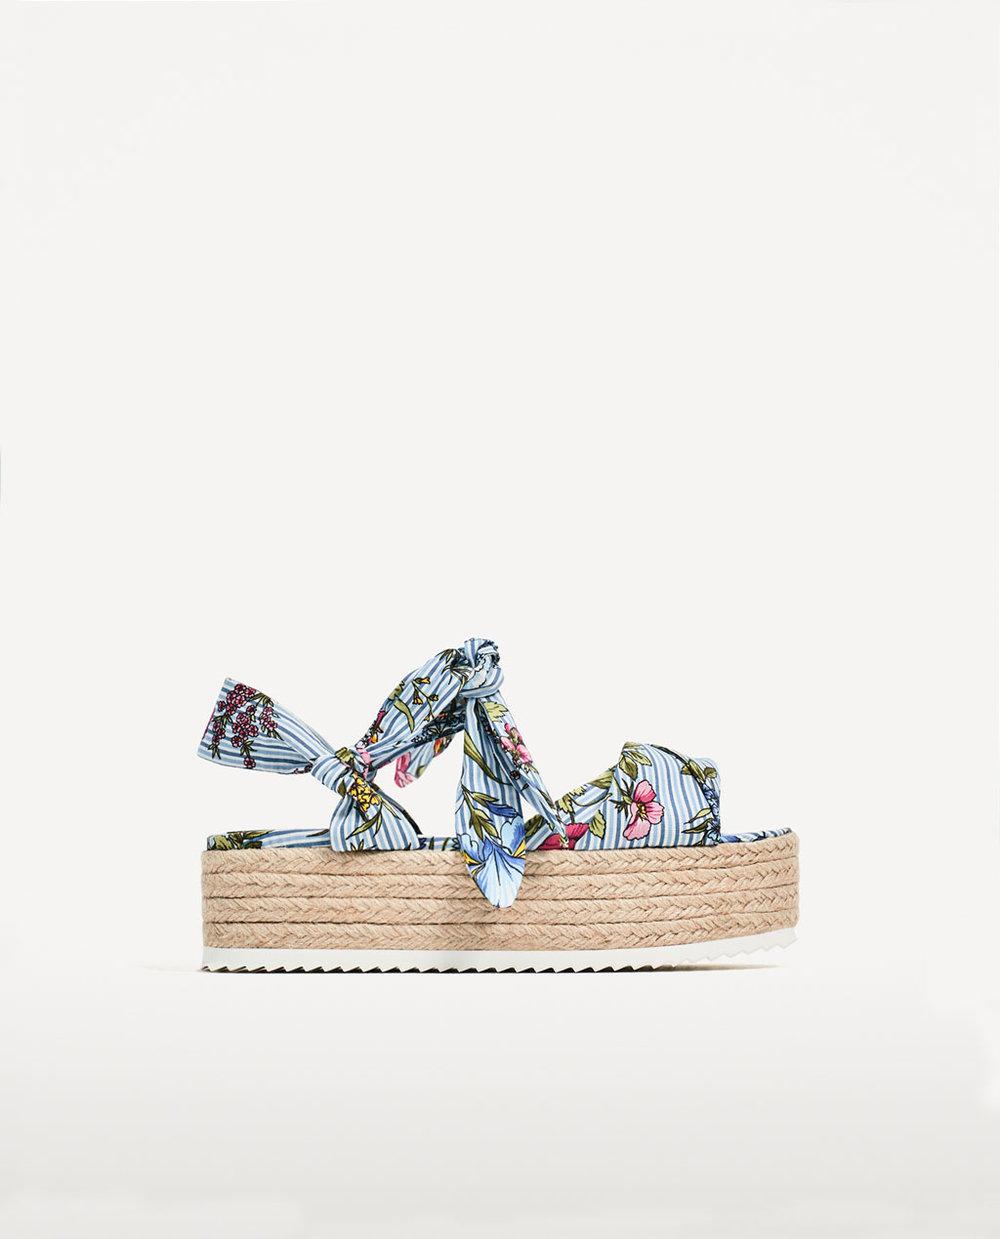 Floral Tied Raffia Wedge, Zara, £49.99